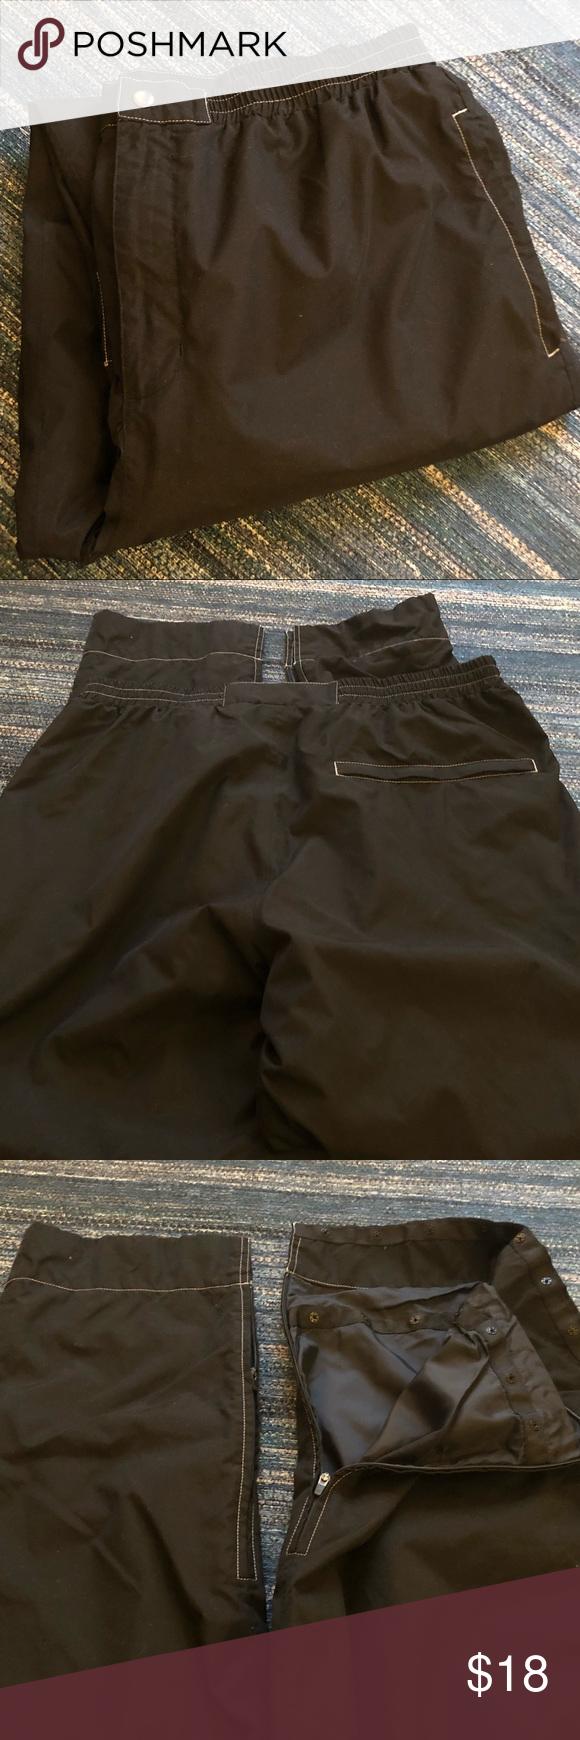 🎈 Rain & Wind Proof Golf Mens Pants 🏌🏽 ♂️- XL SALE